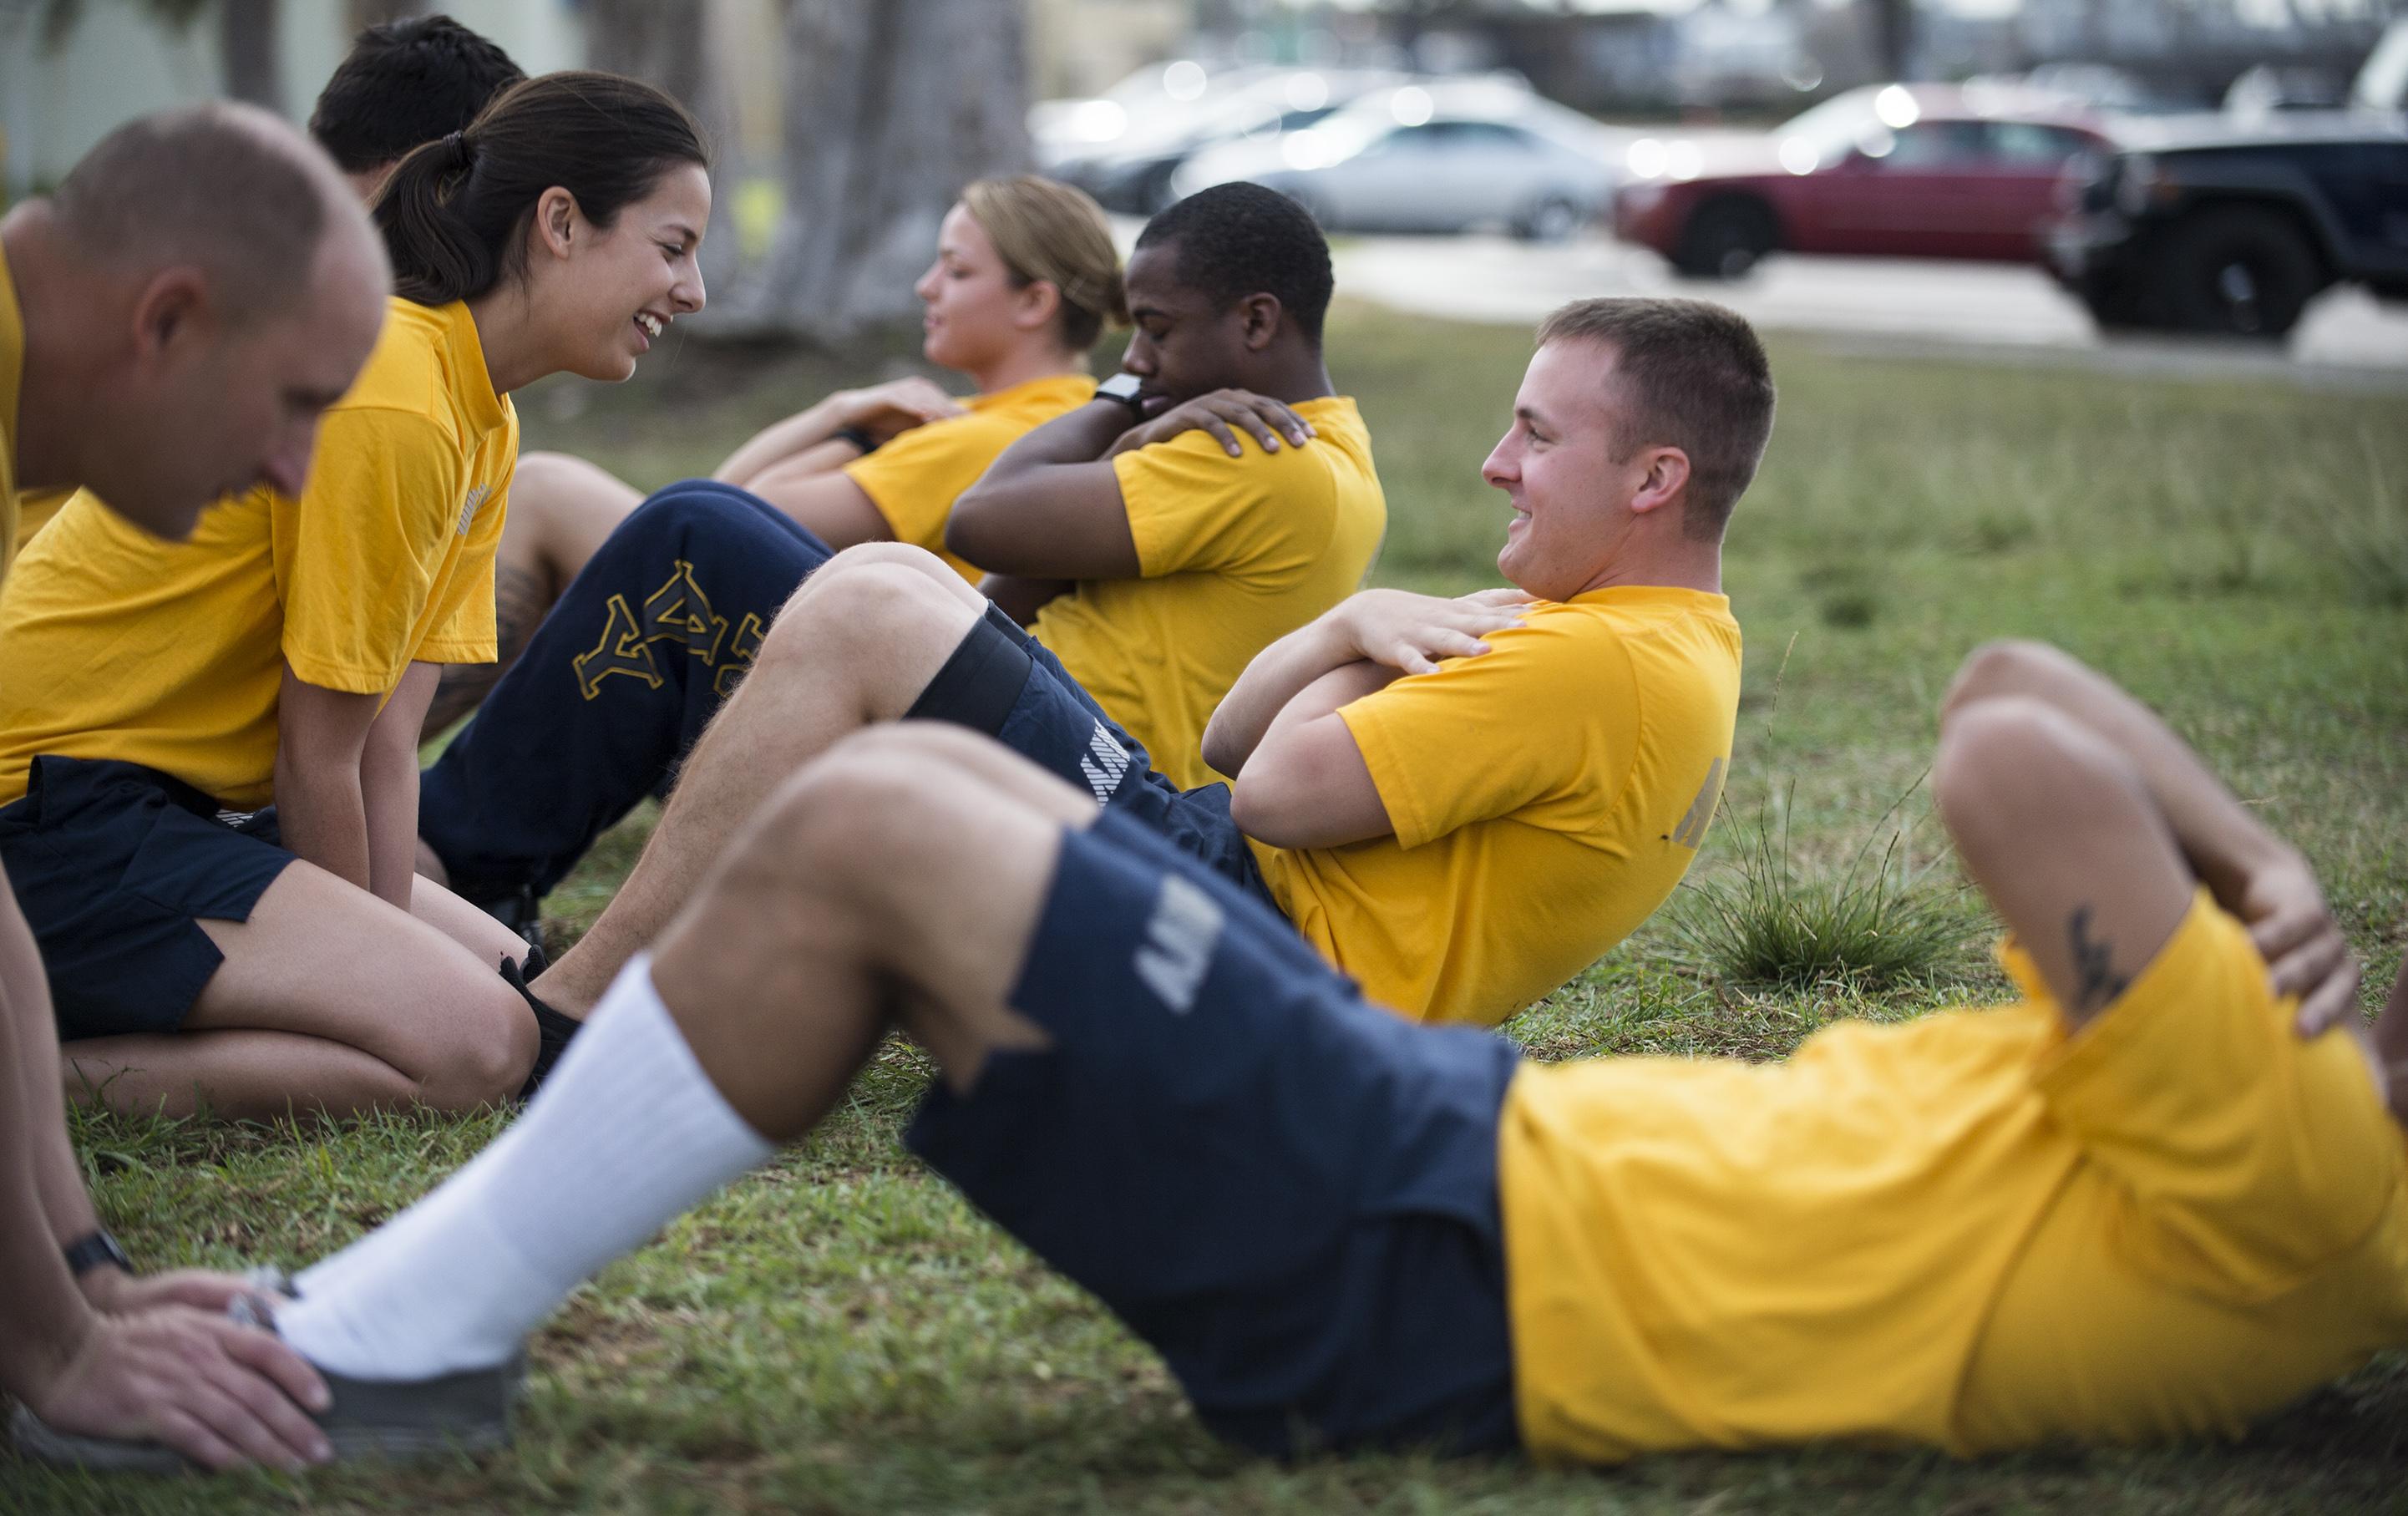 Expert: Navy fitness test needs work